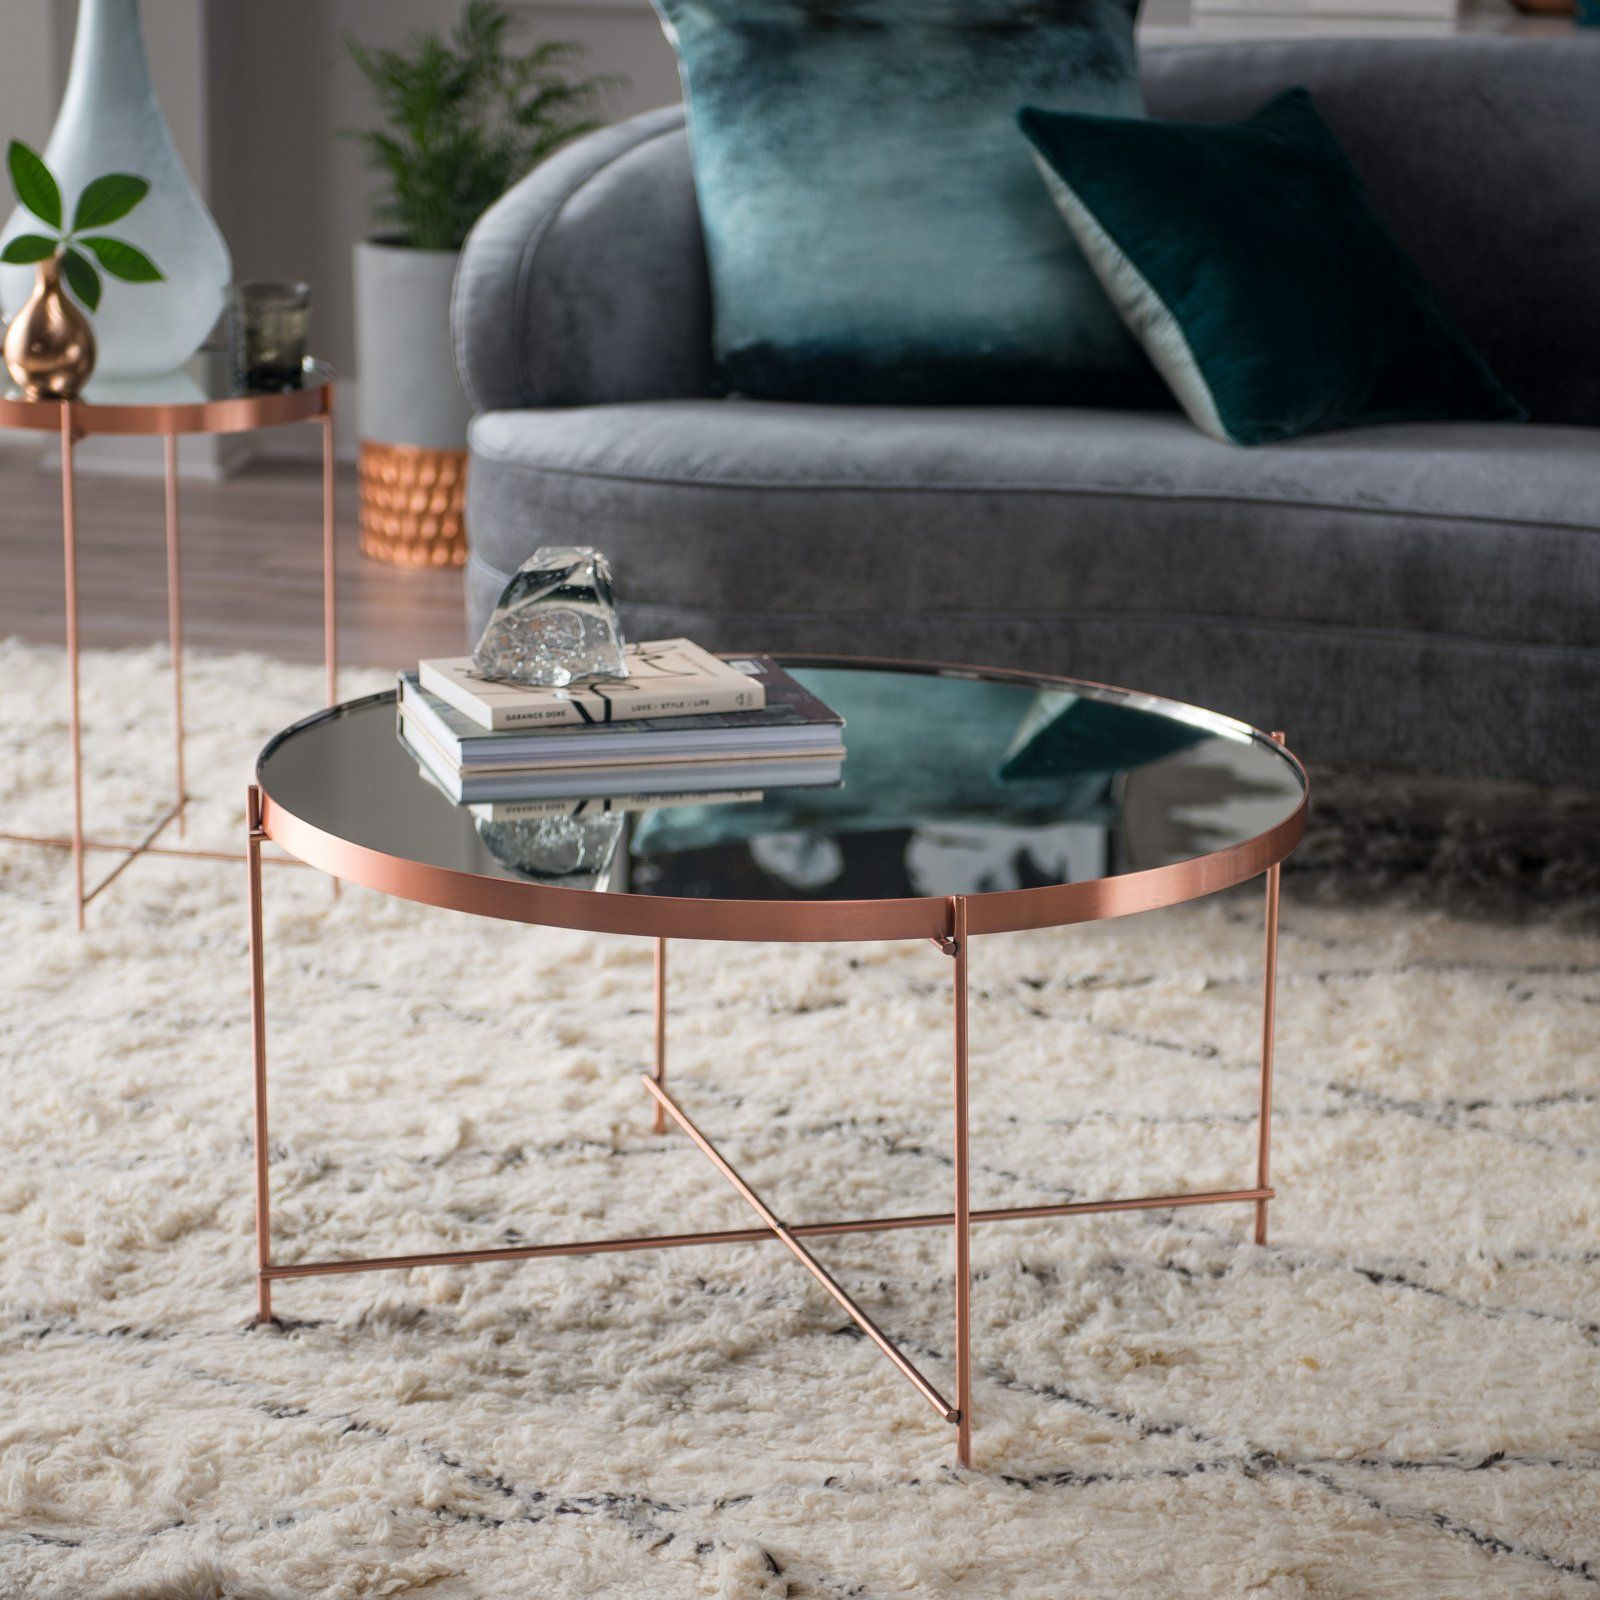 Belham Living Bradley Round Copper Coffee Table Coffee Table